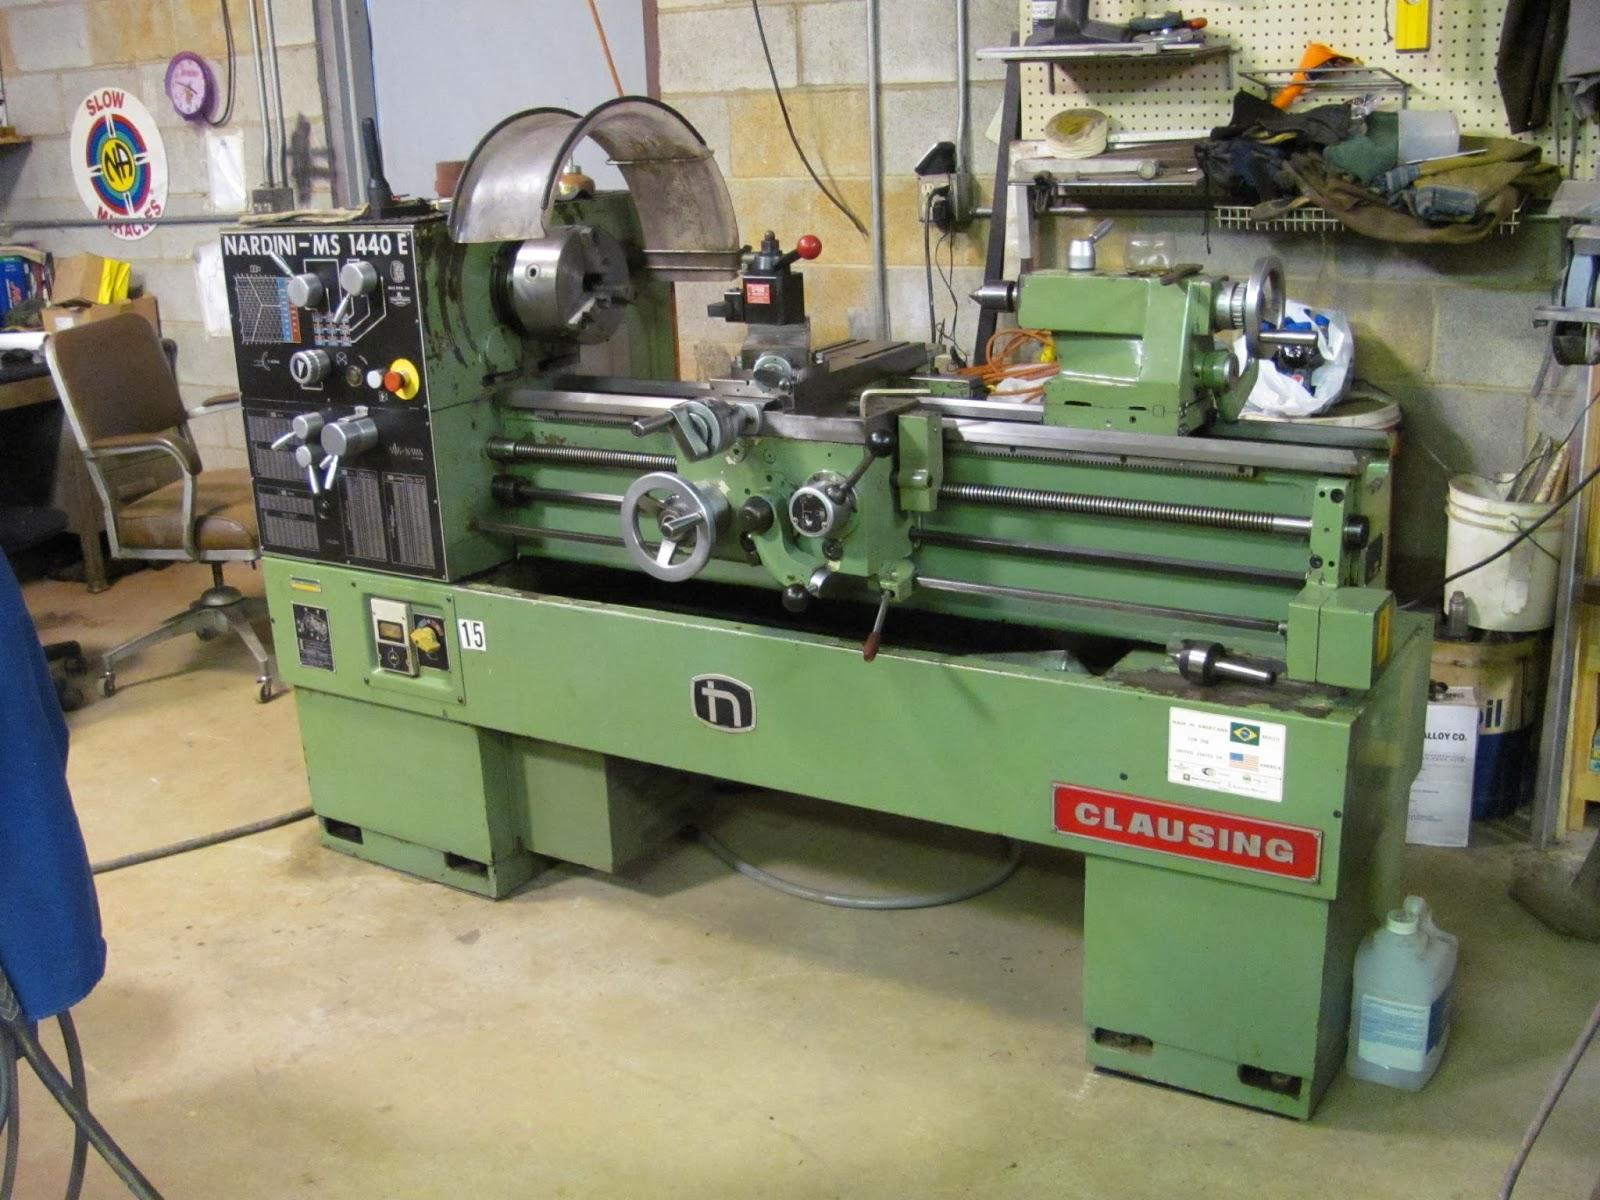 machine id d nardini ms 1440 e metal lathe labeled clausing ozark rh ozarktoolmanuals com nardini ms 1440 manual